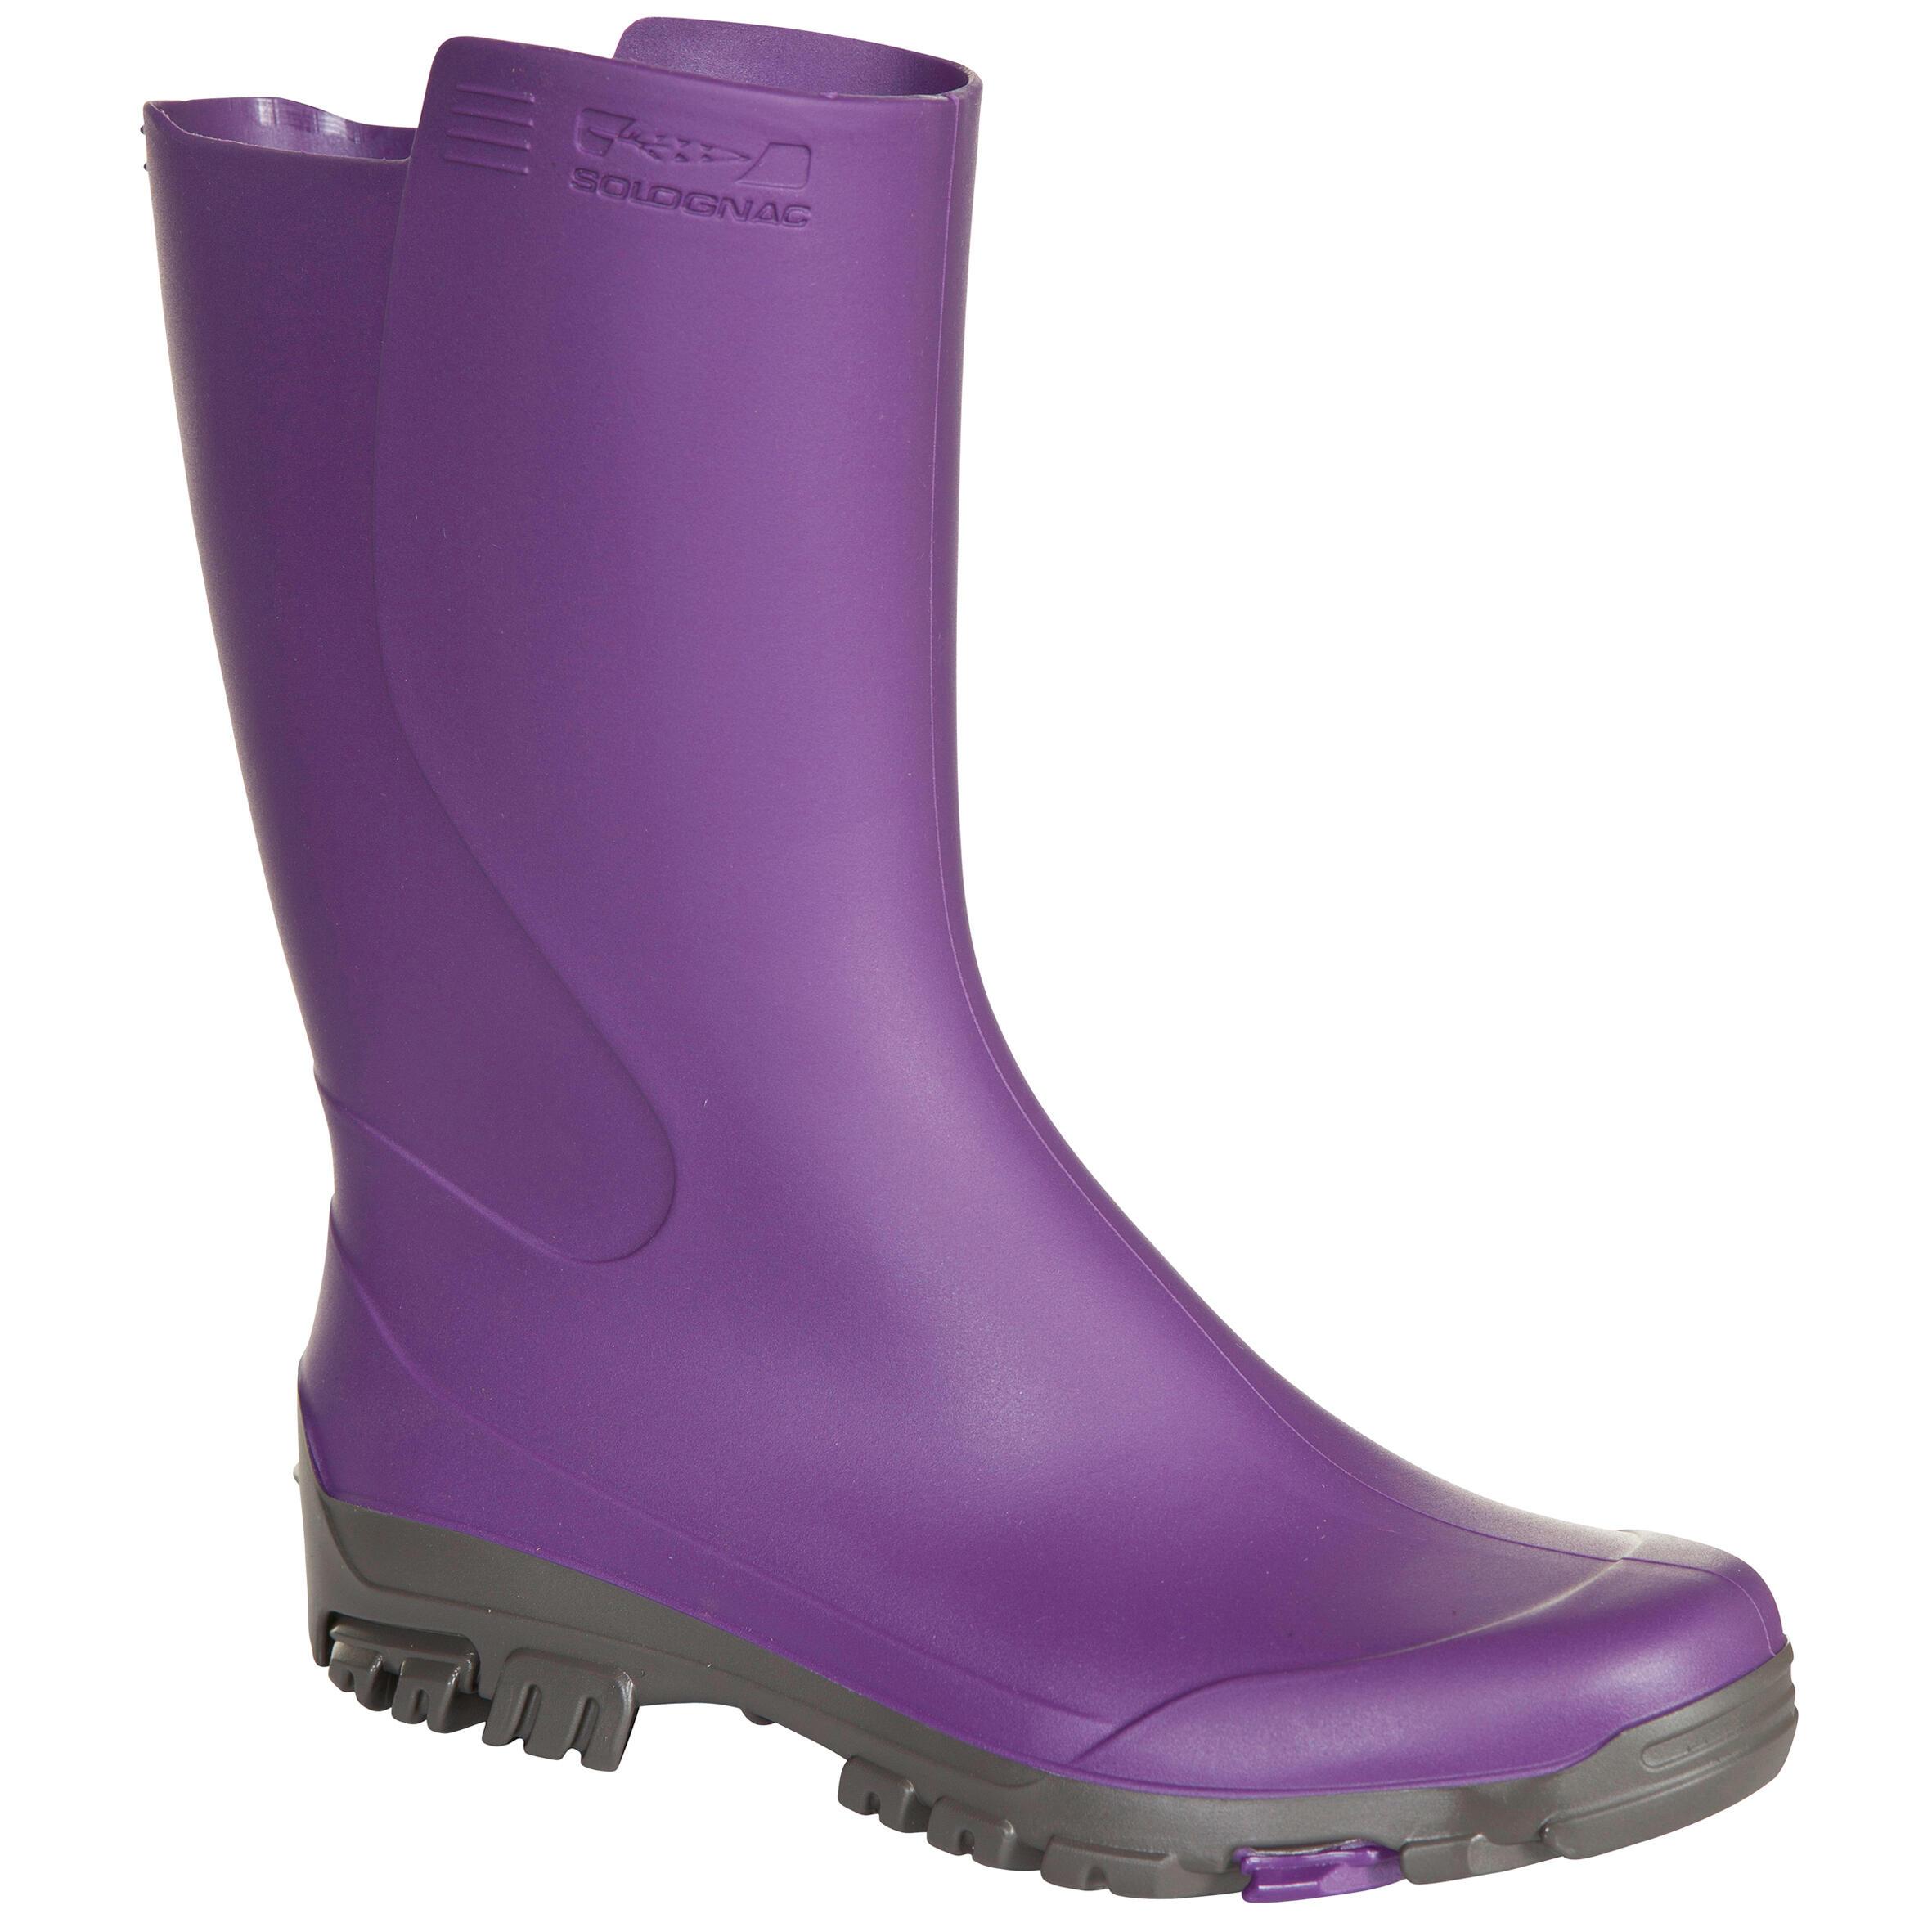 Gummistiefel Inverness 100 Gr. 35-42 violett | Schuhe > Gummistiefel | Violett | Solognac